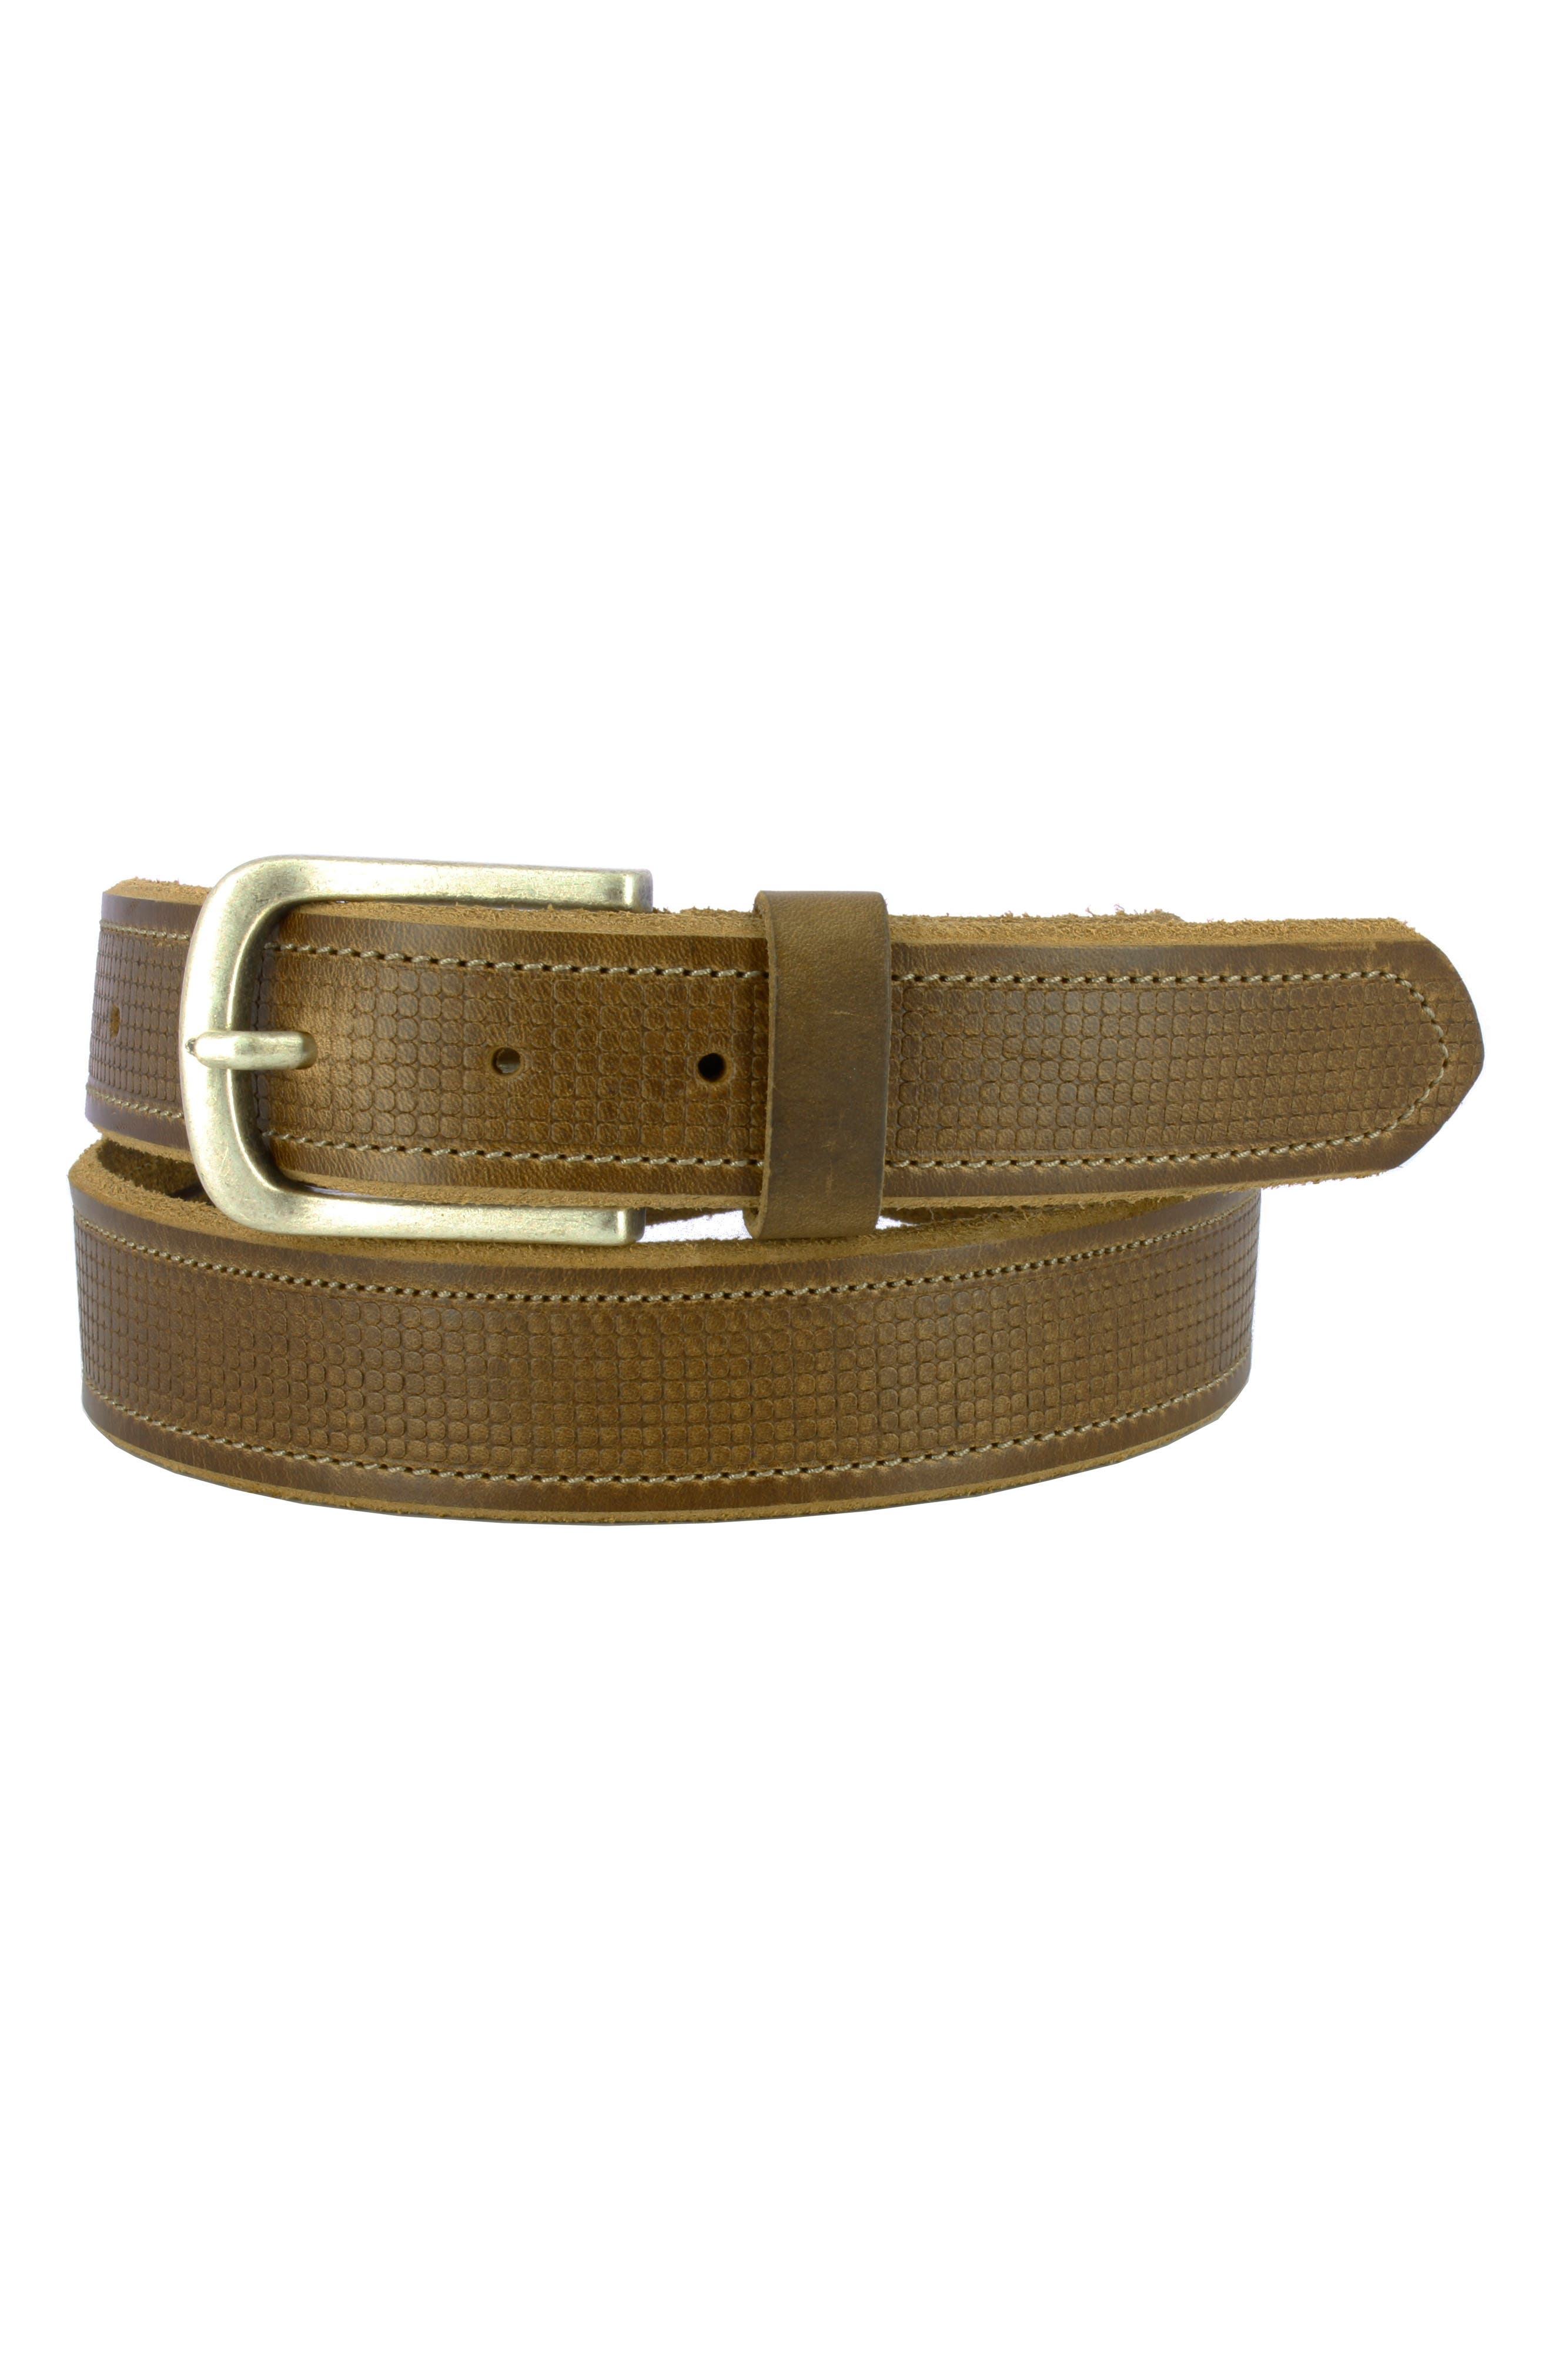 Remo Tulliani Sixx 2 Horween Leather Belt, Tan